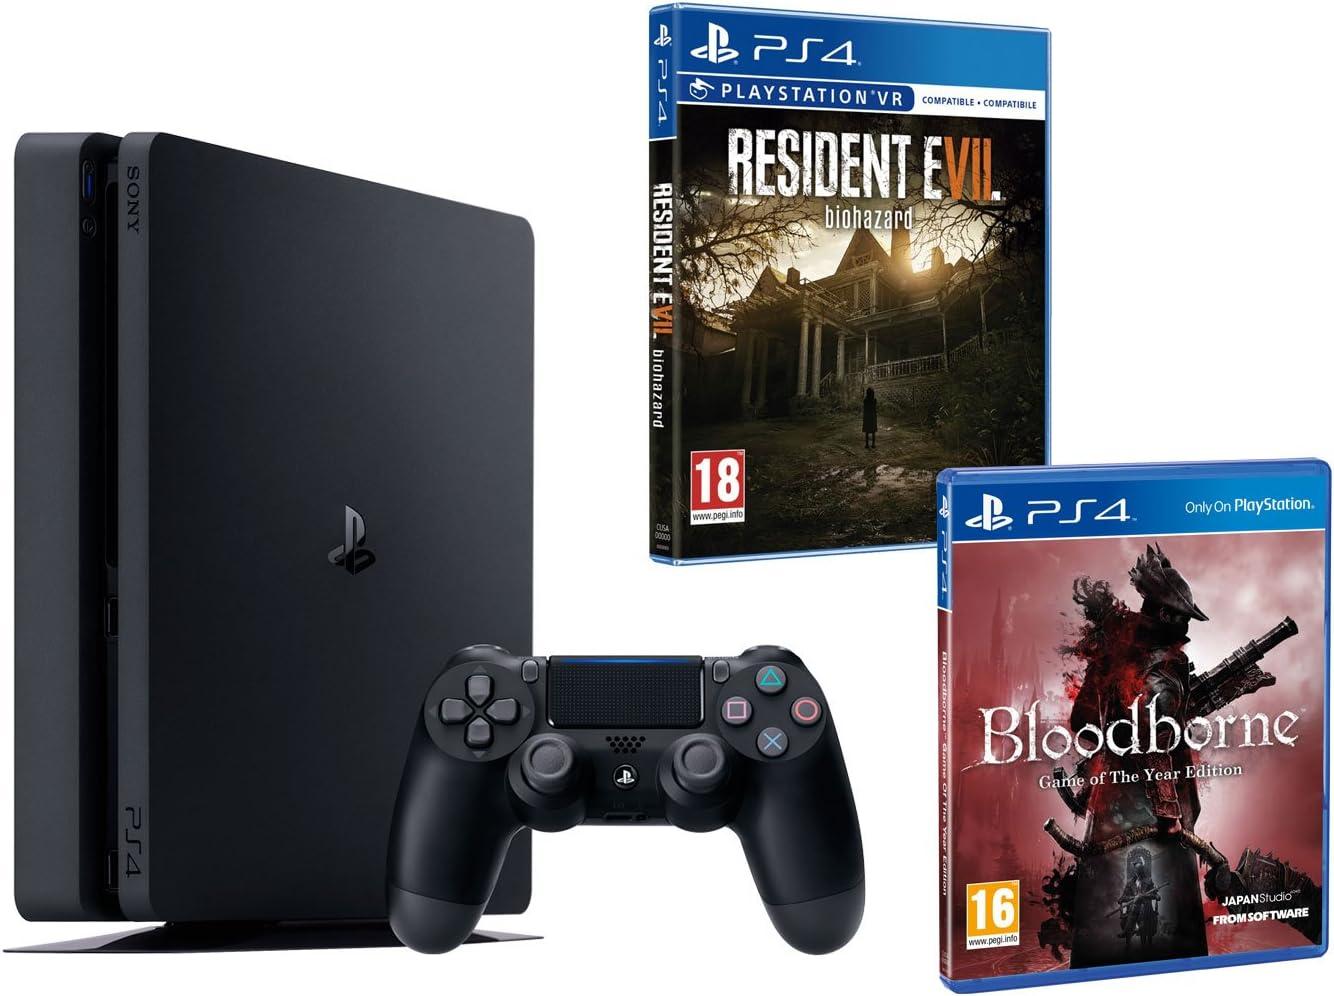 PS4 Slim 1TO Negro Playstation 4 Pack 2 Juegos – Bloodborne GOTY + Resident Evil VII: Amazon.es: Informática